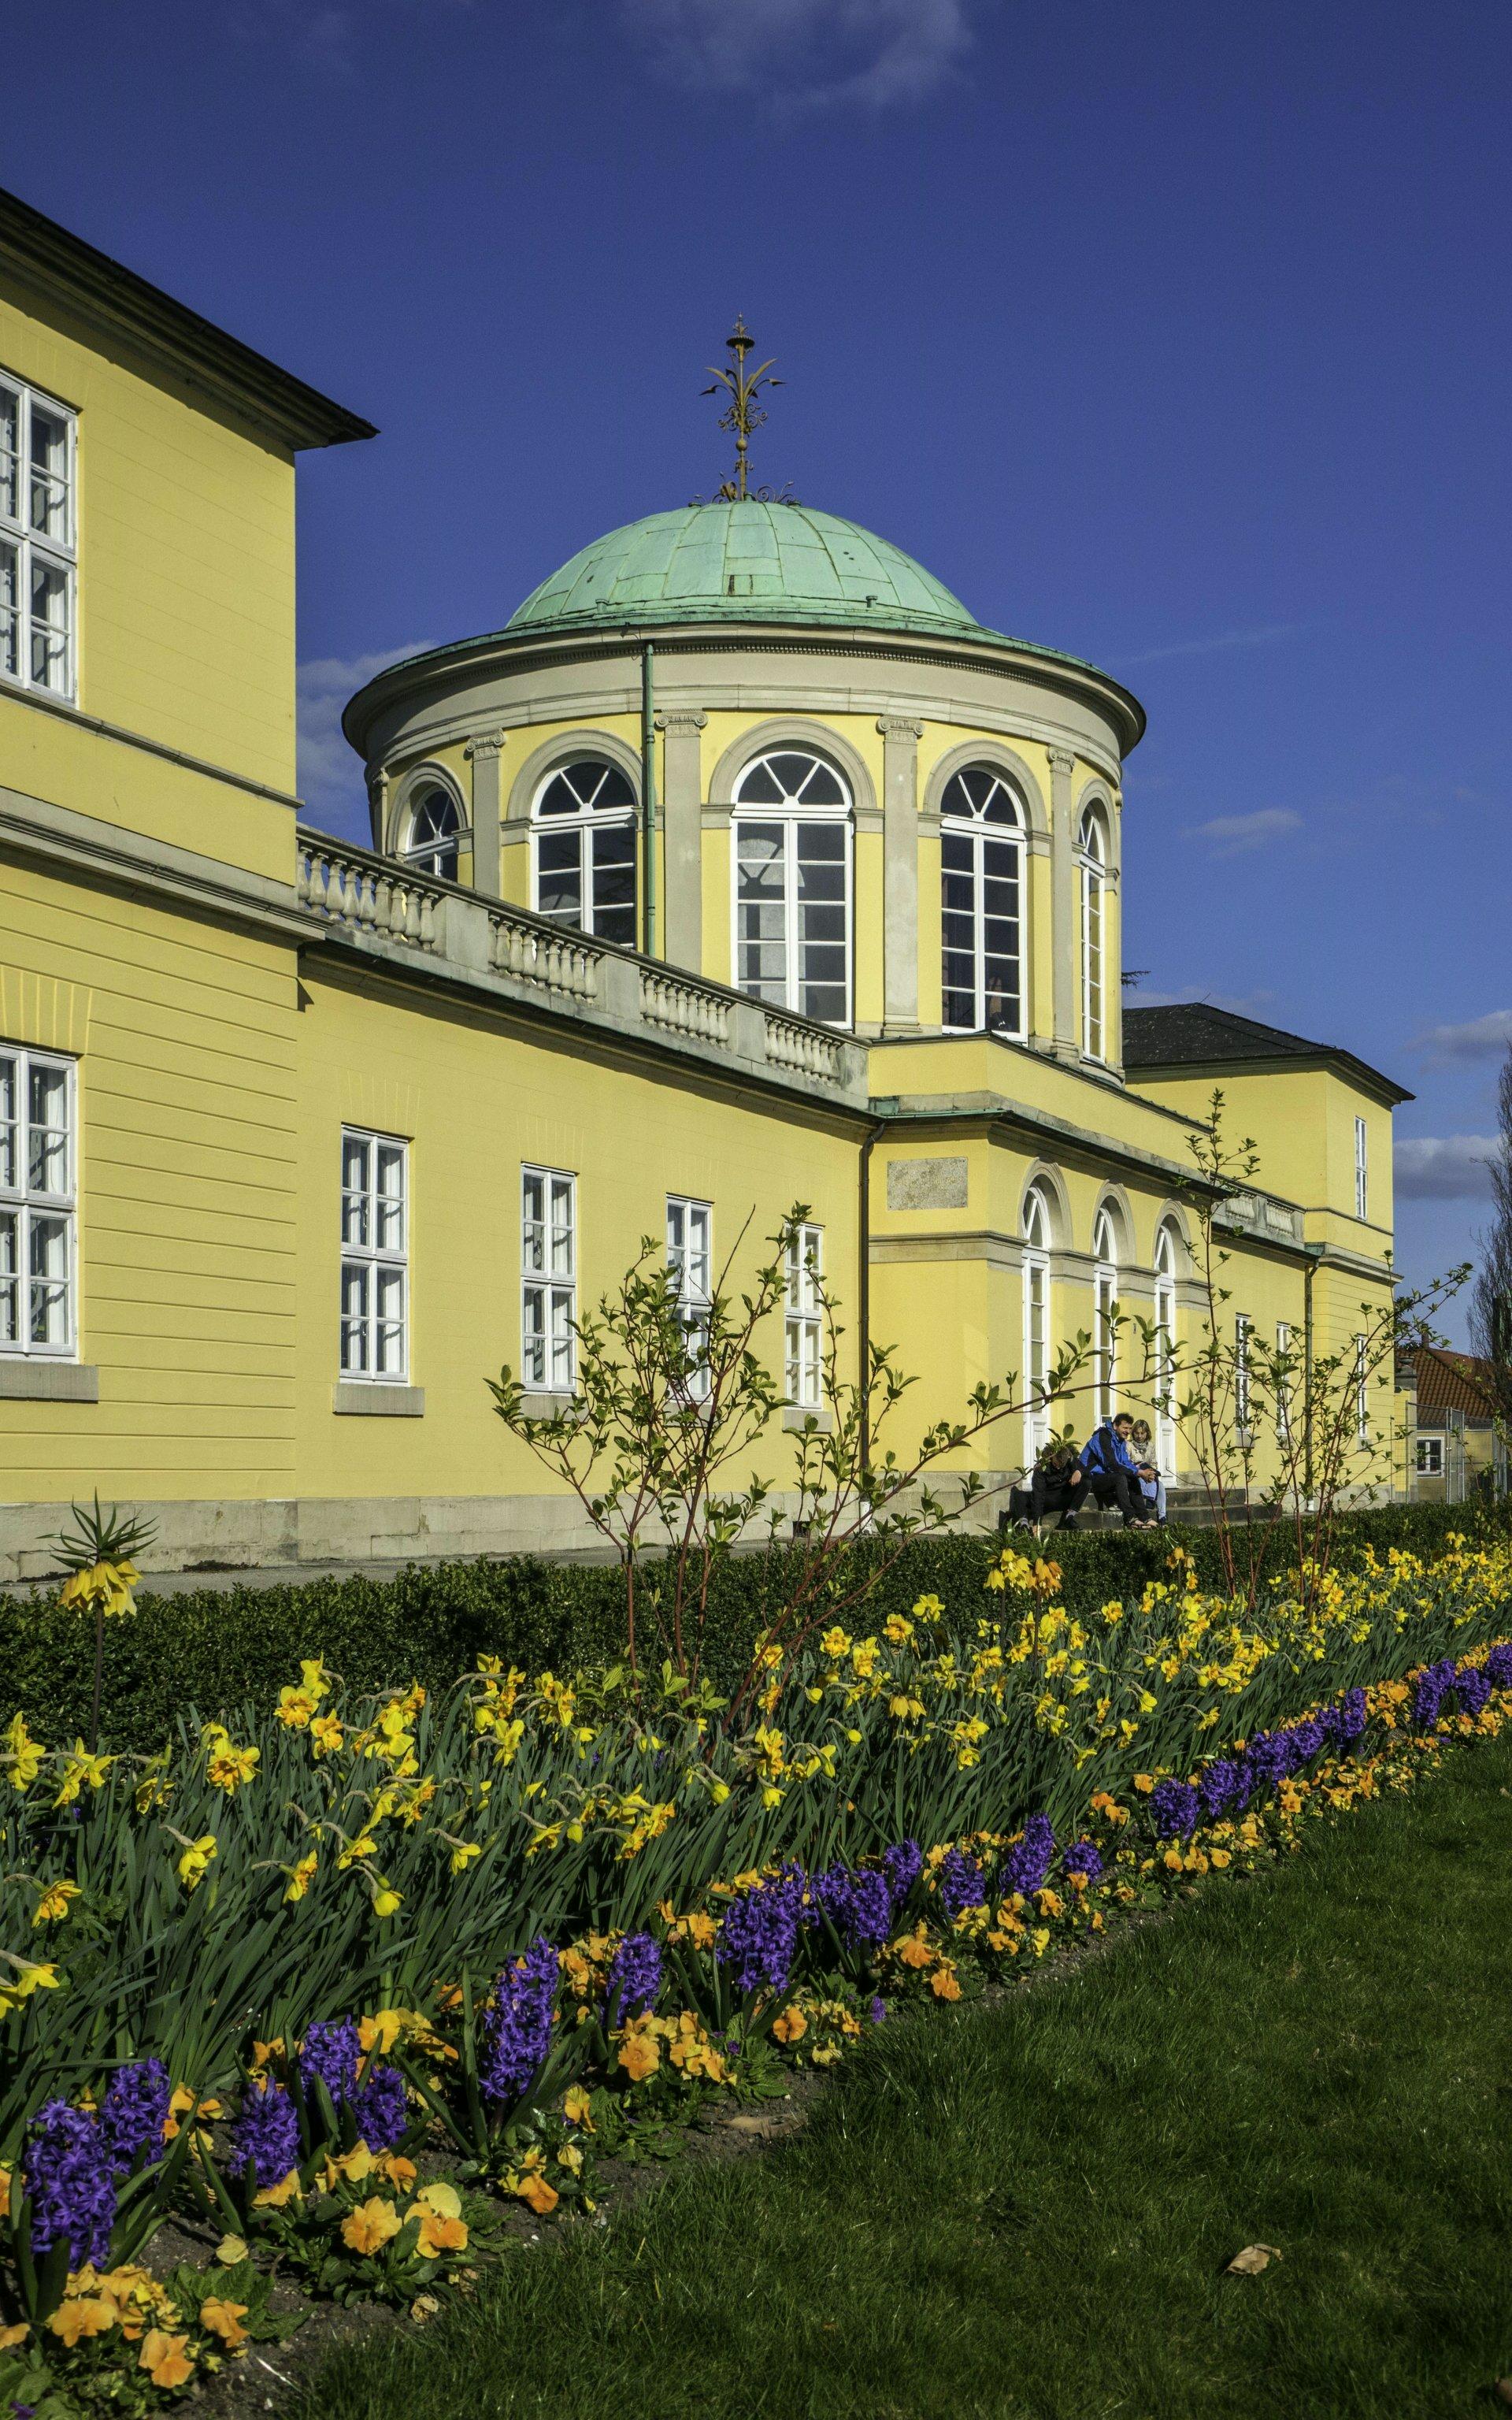 Bibliothekspavillion vor dem Berggarten